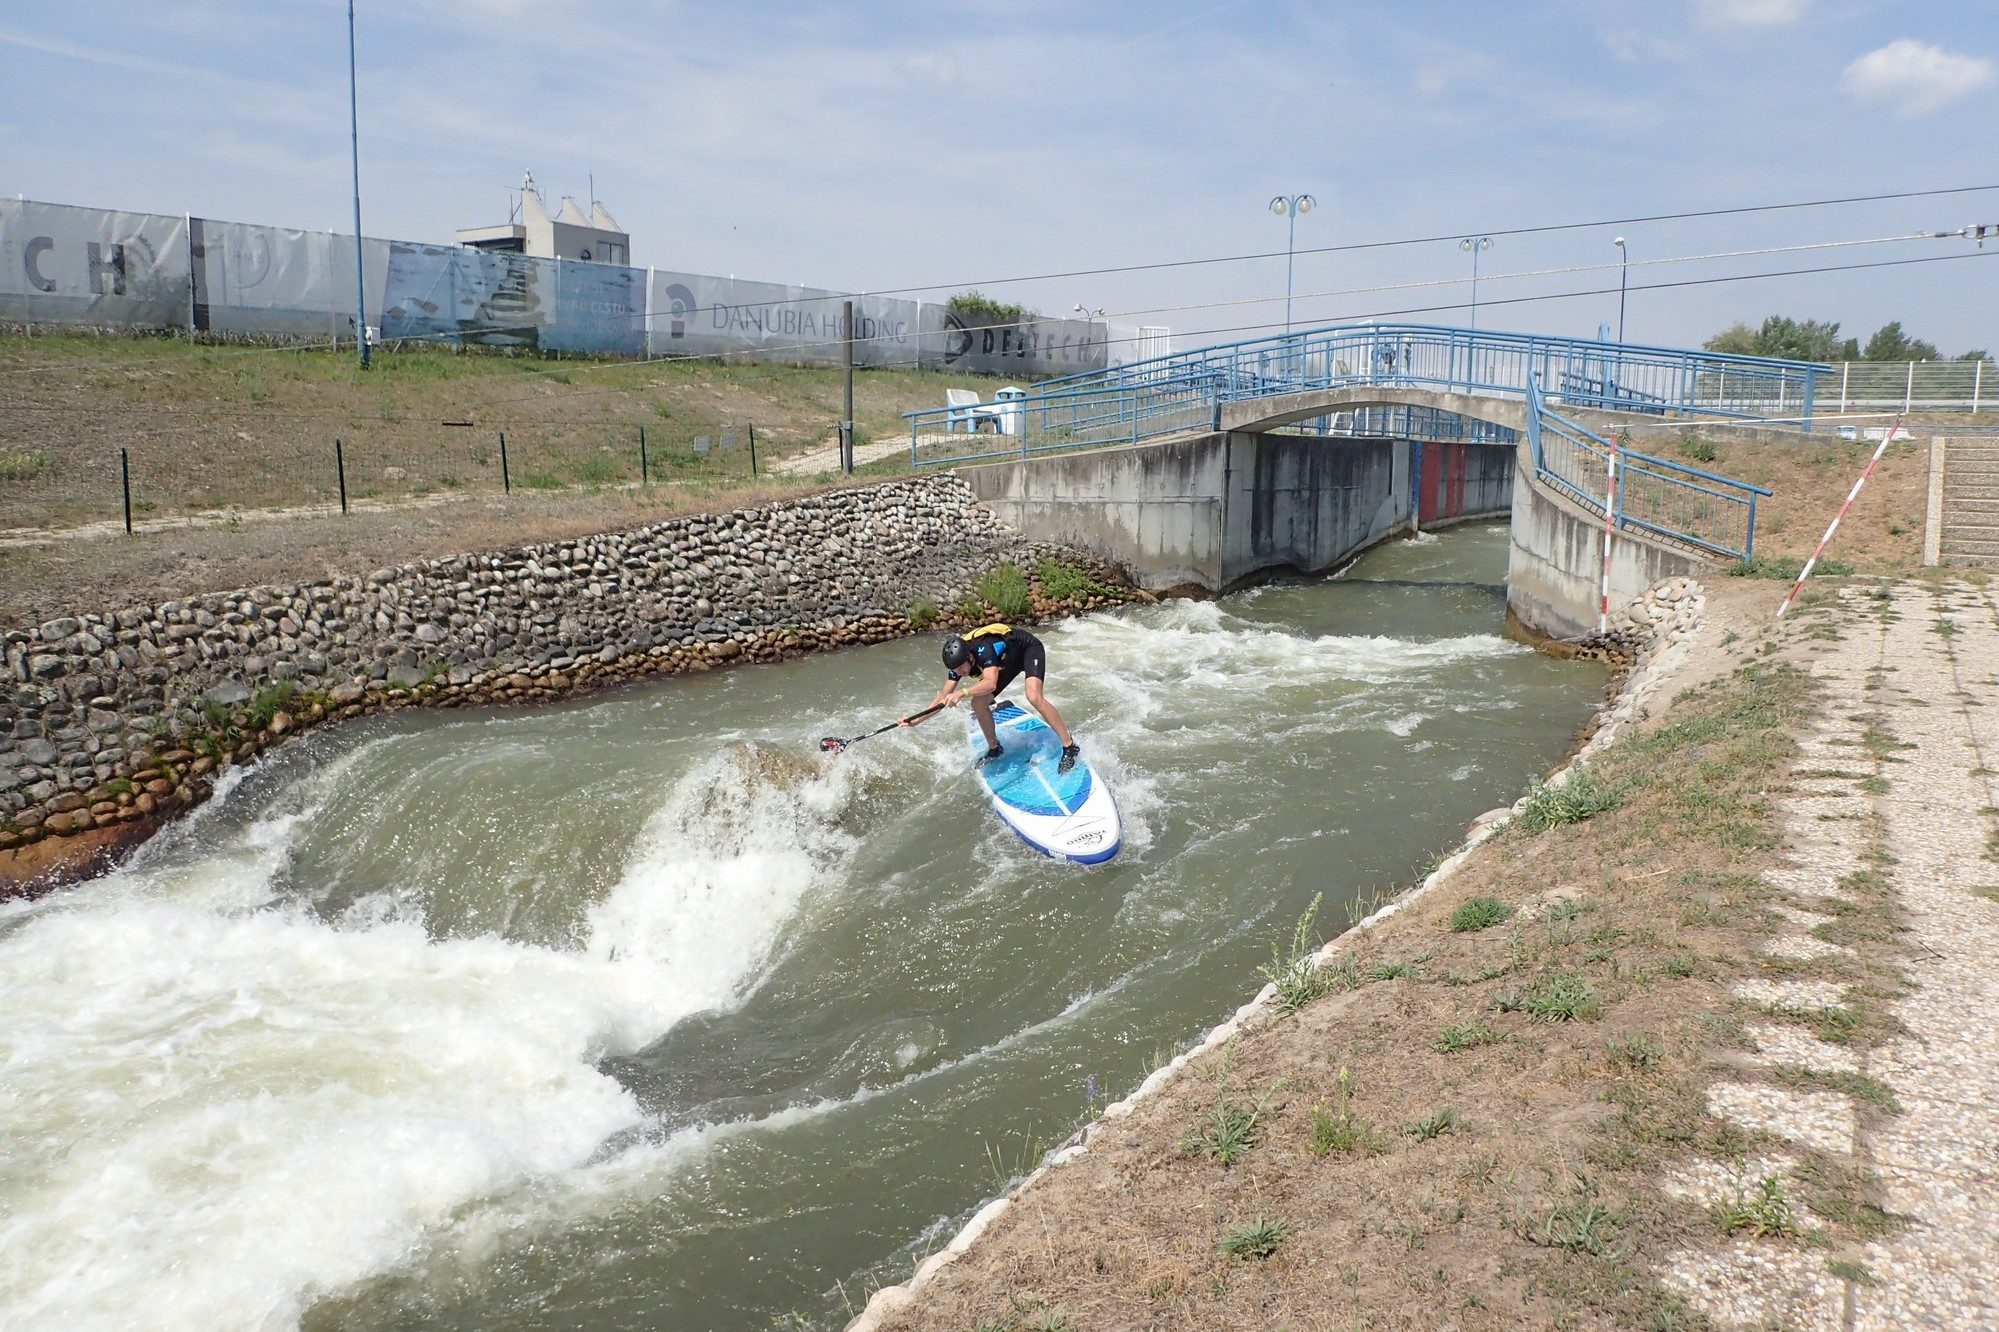 Slovakia: Čunovo Water Sports Centre